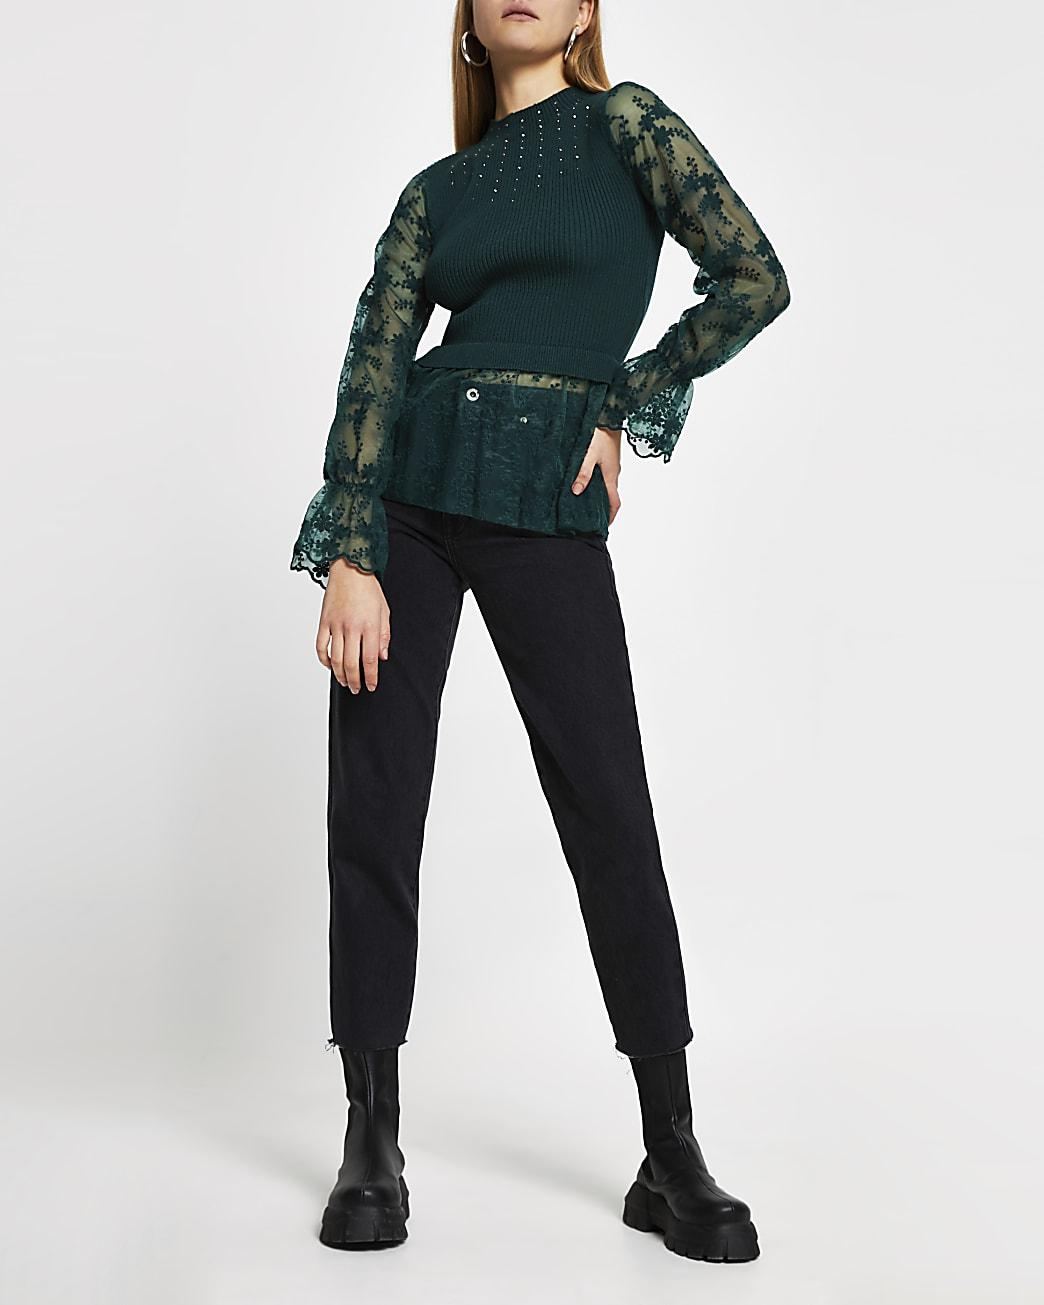 Green lace embellished hybrid top